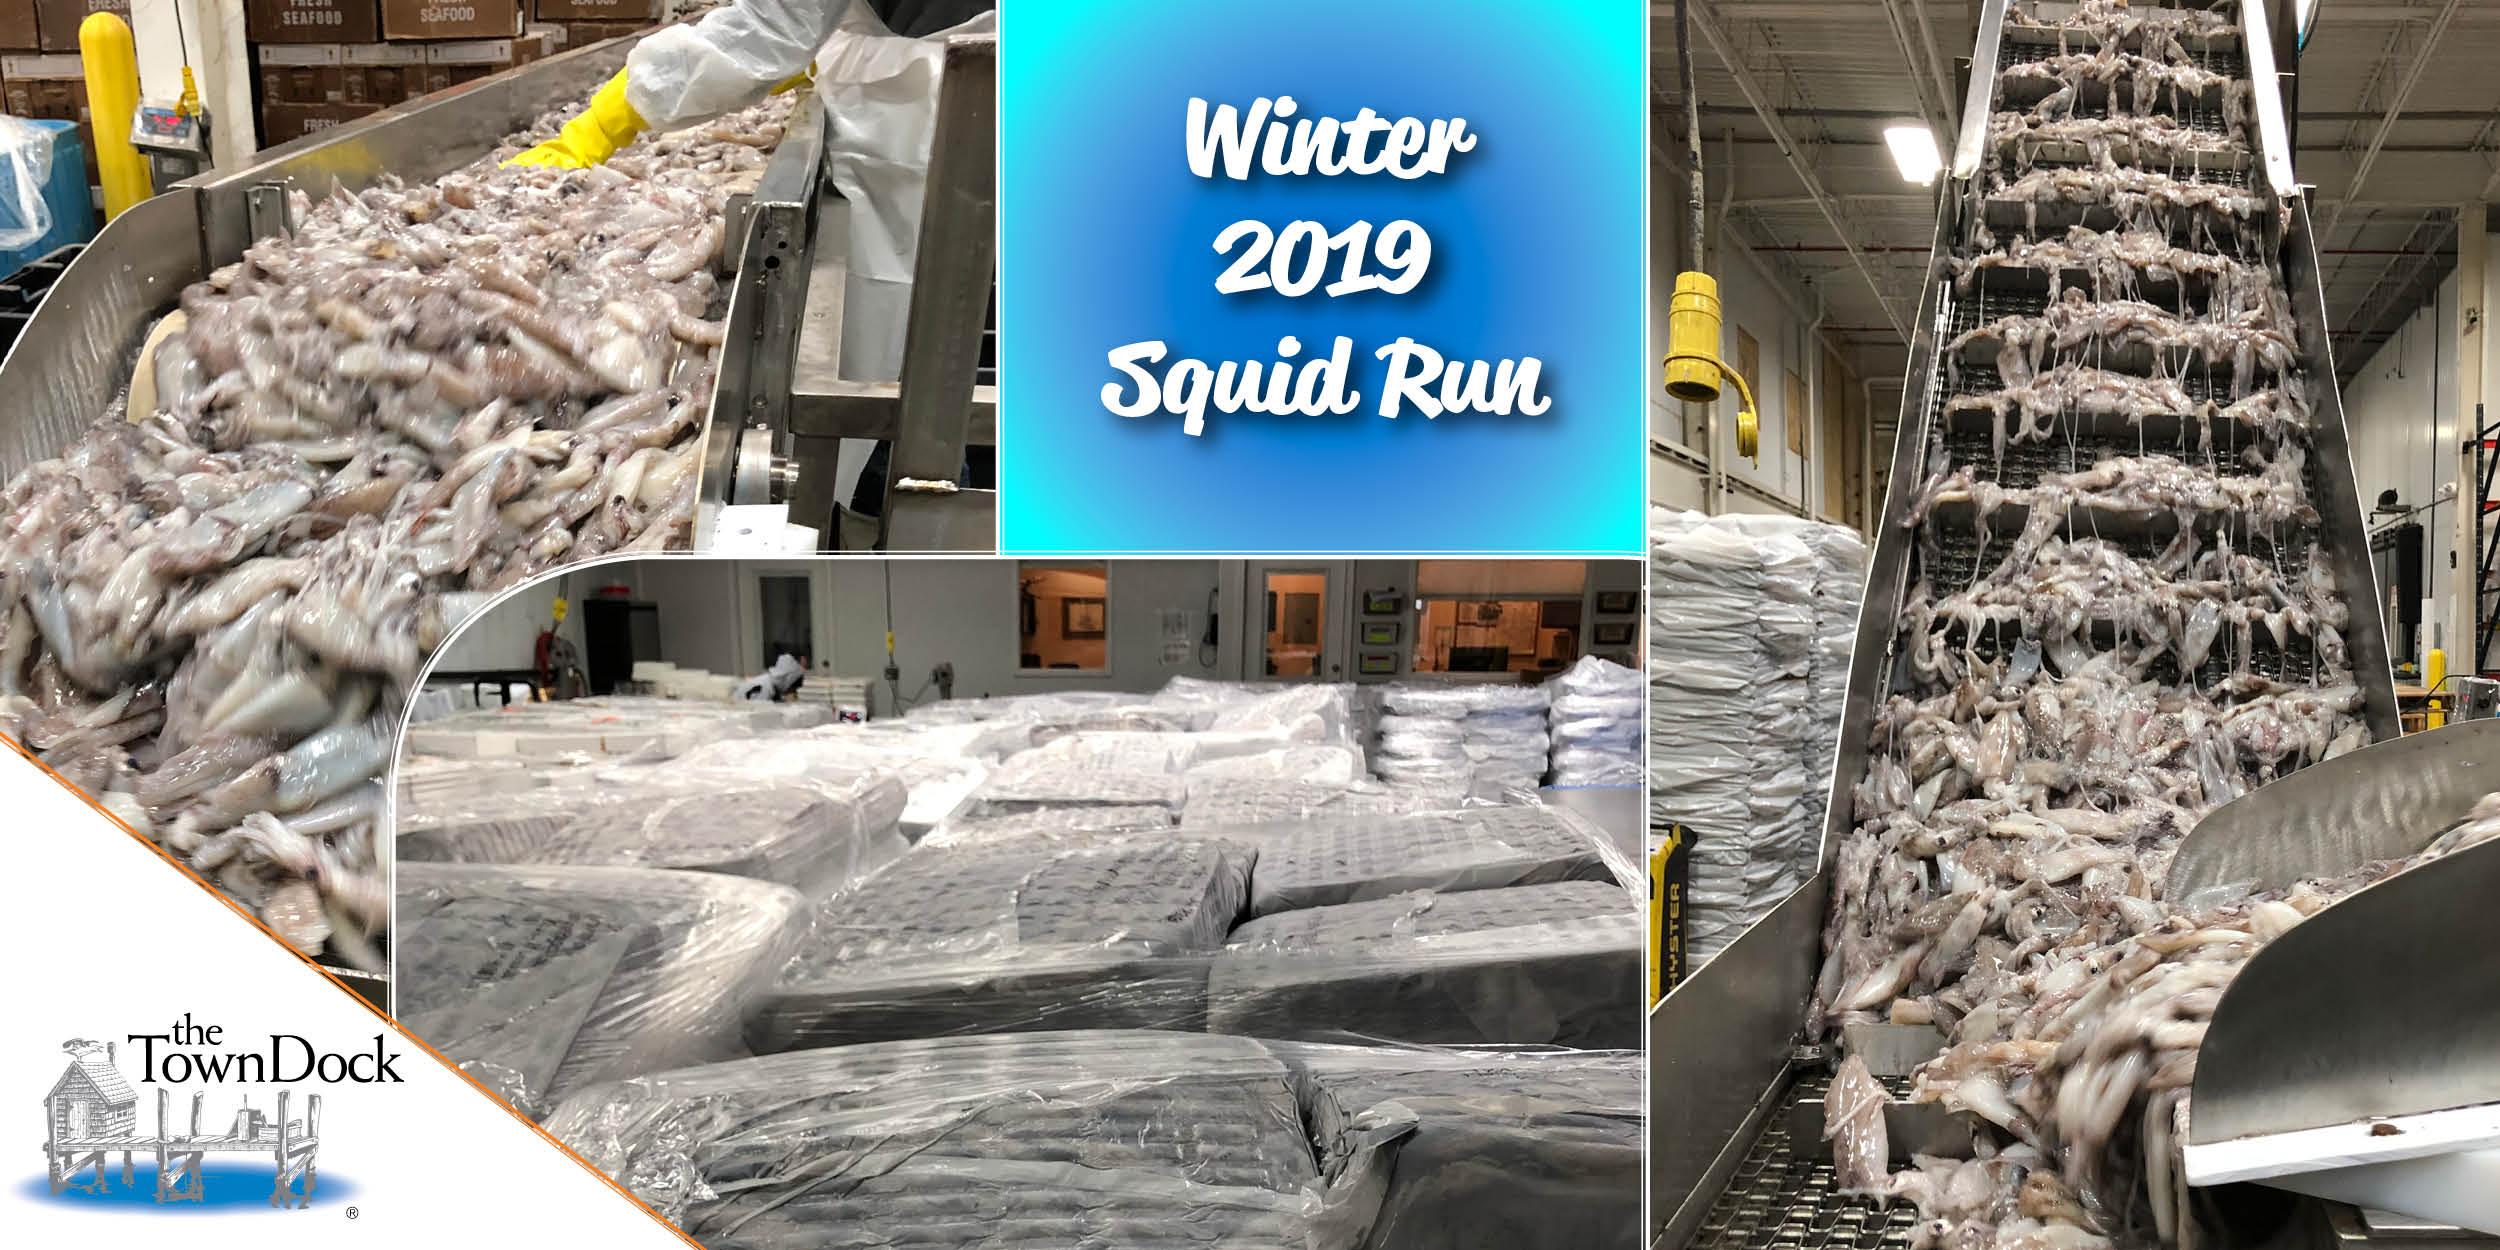 Winter 2019 Squid Run